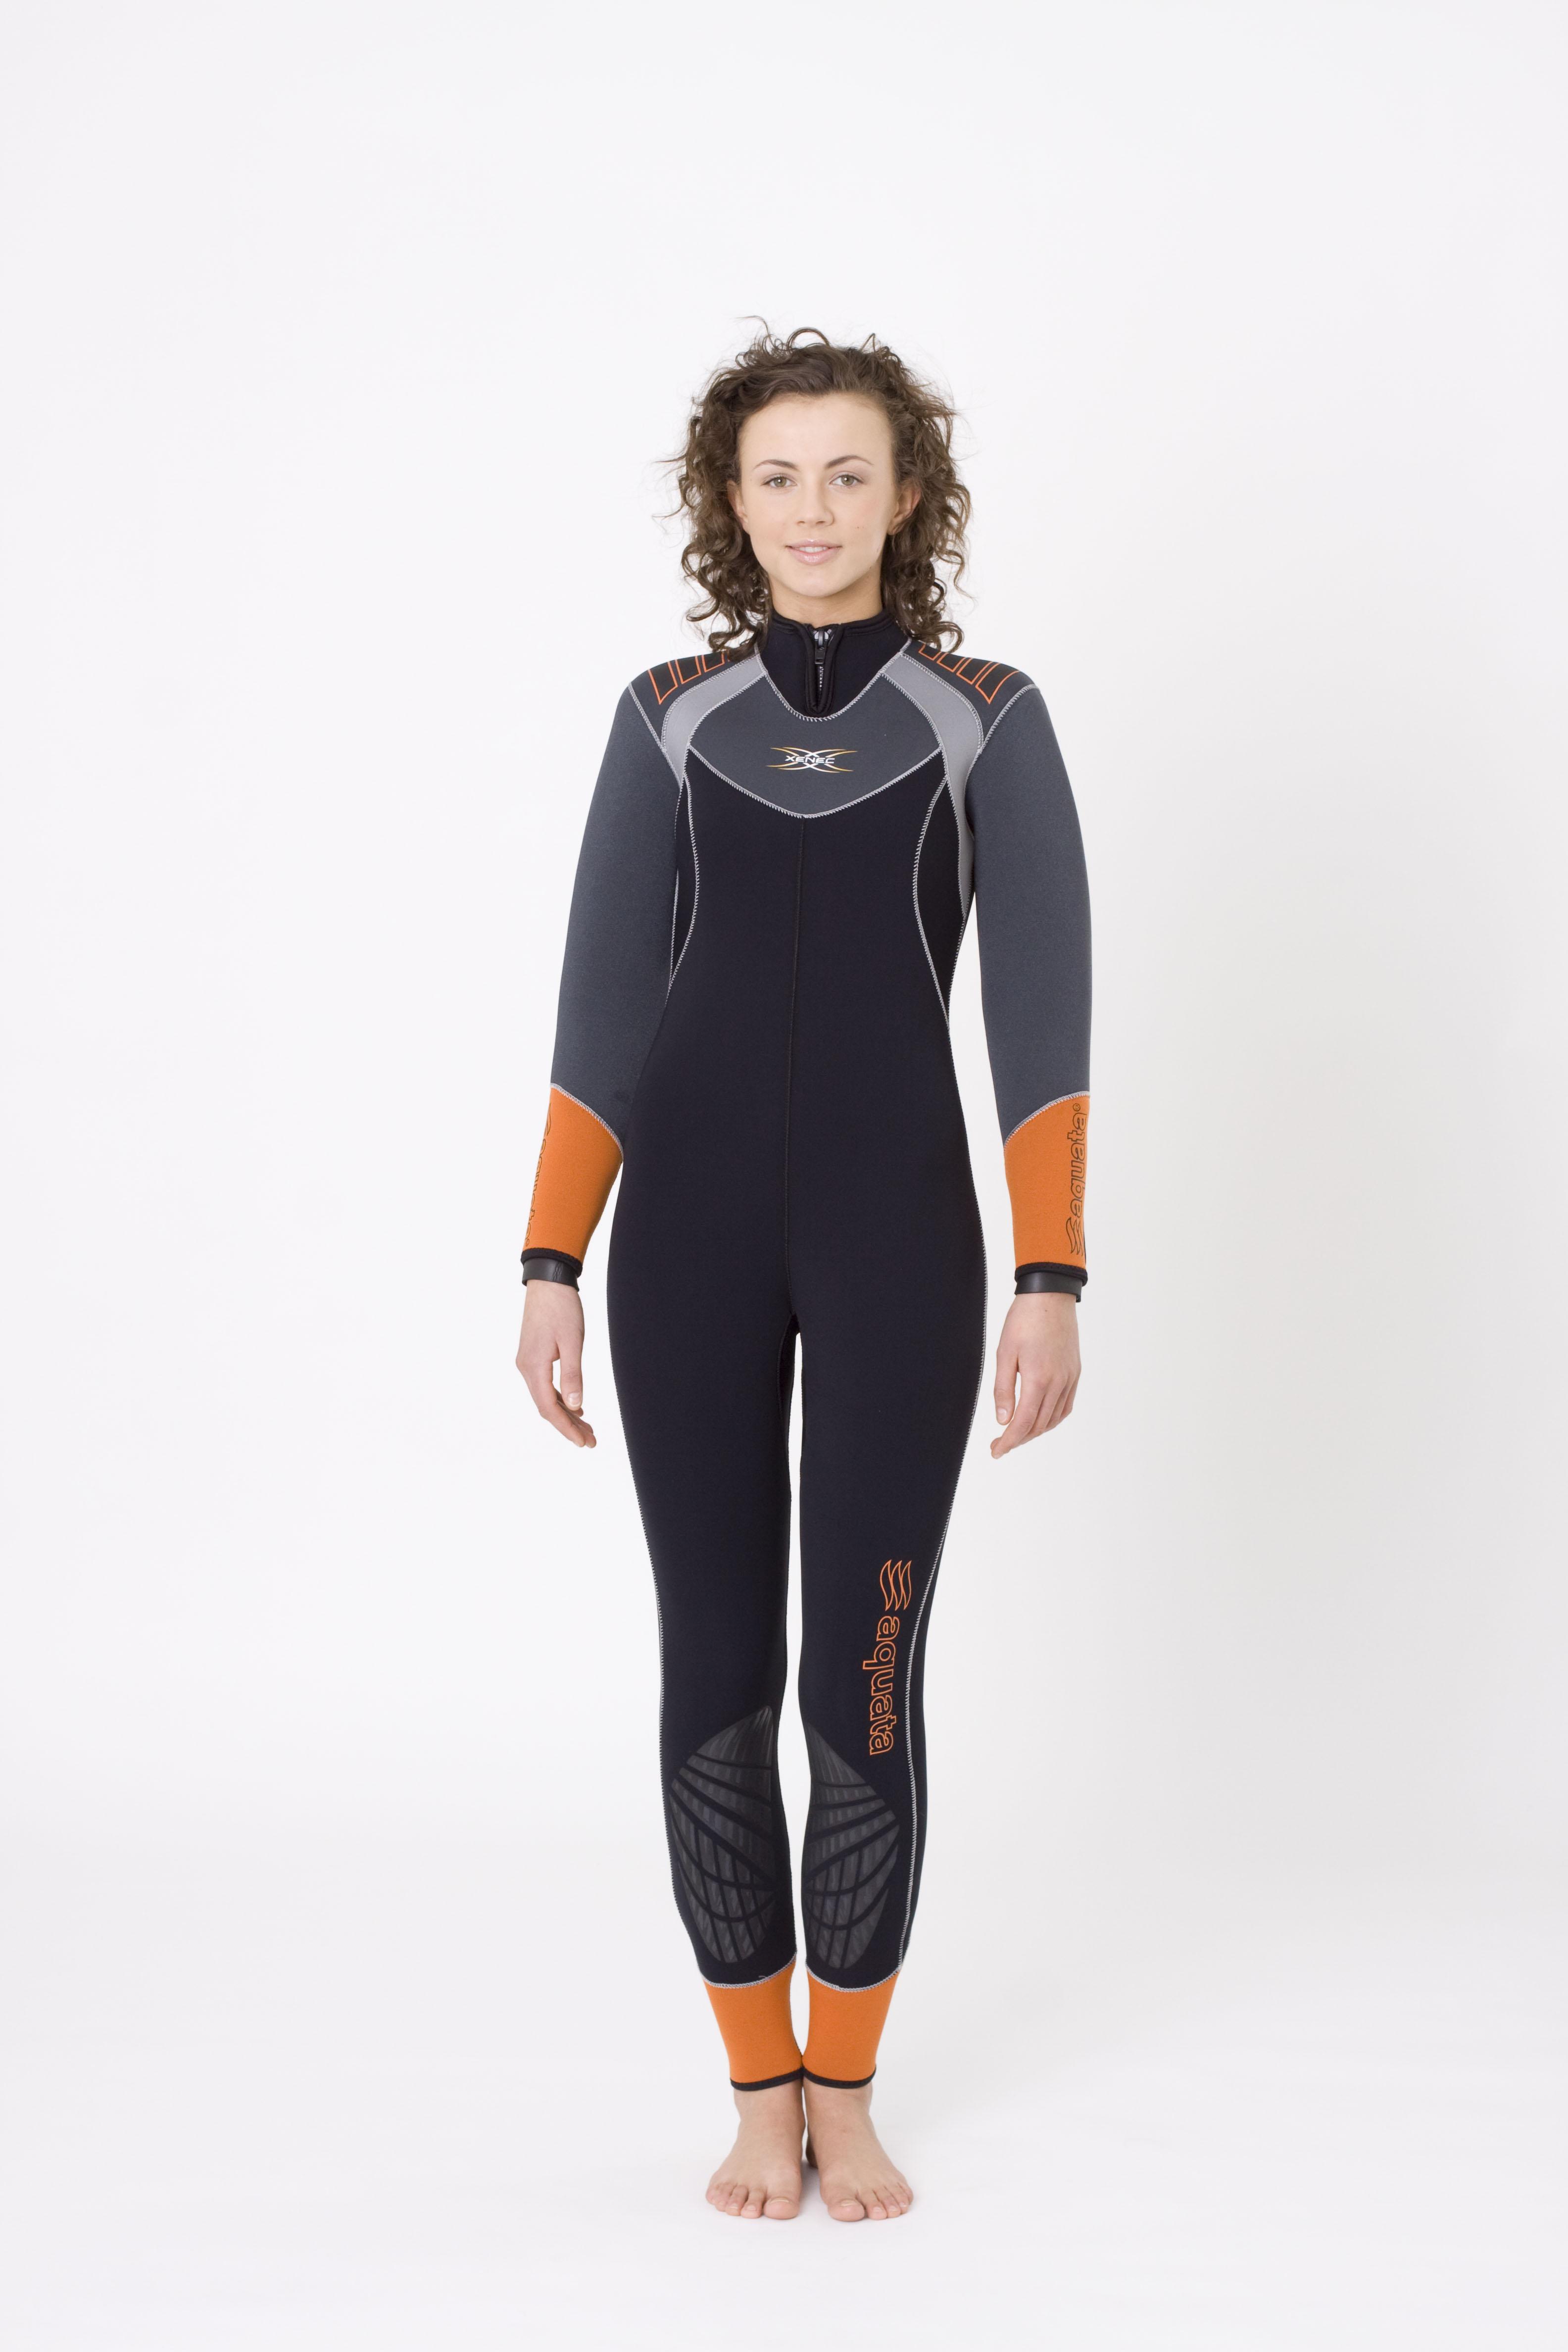 Halbtrocken Tauchanzug Overall     Damen  Xenec 09  | aquata